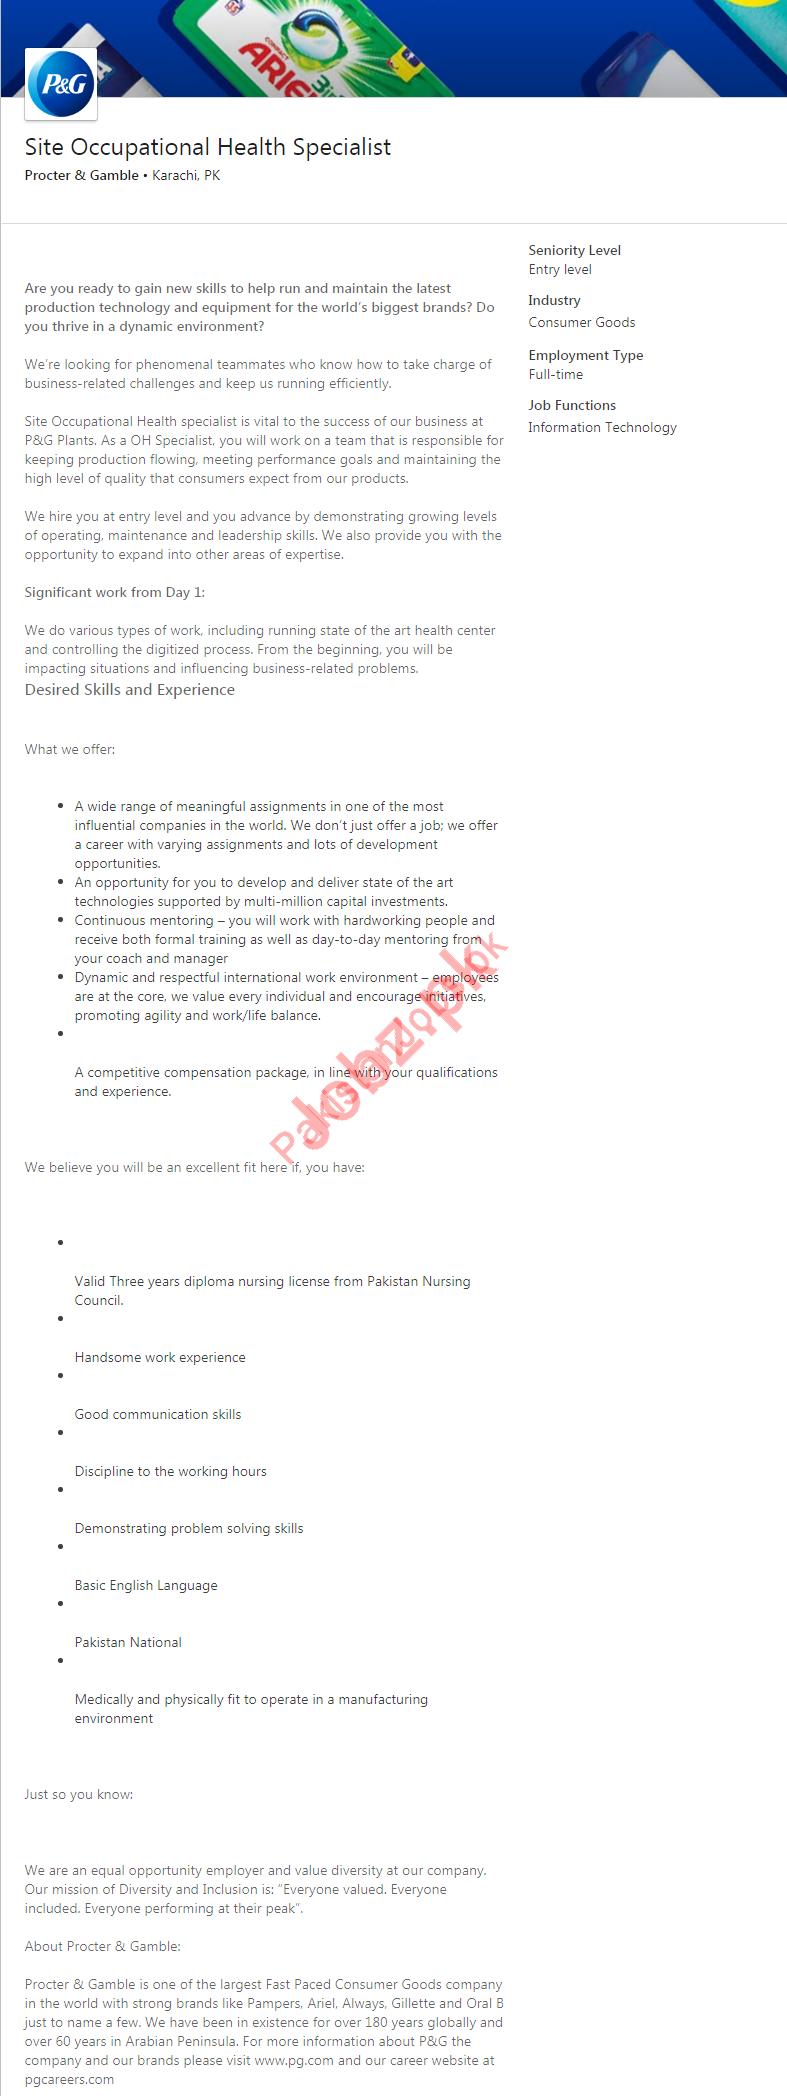 Site Occupational Health Specialist Job 2019 in Karachi